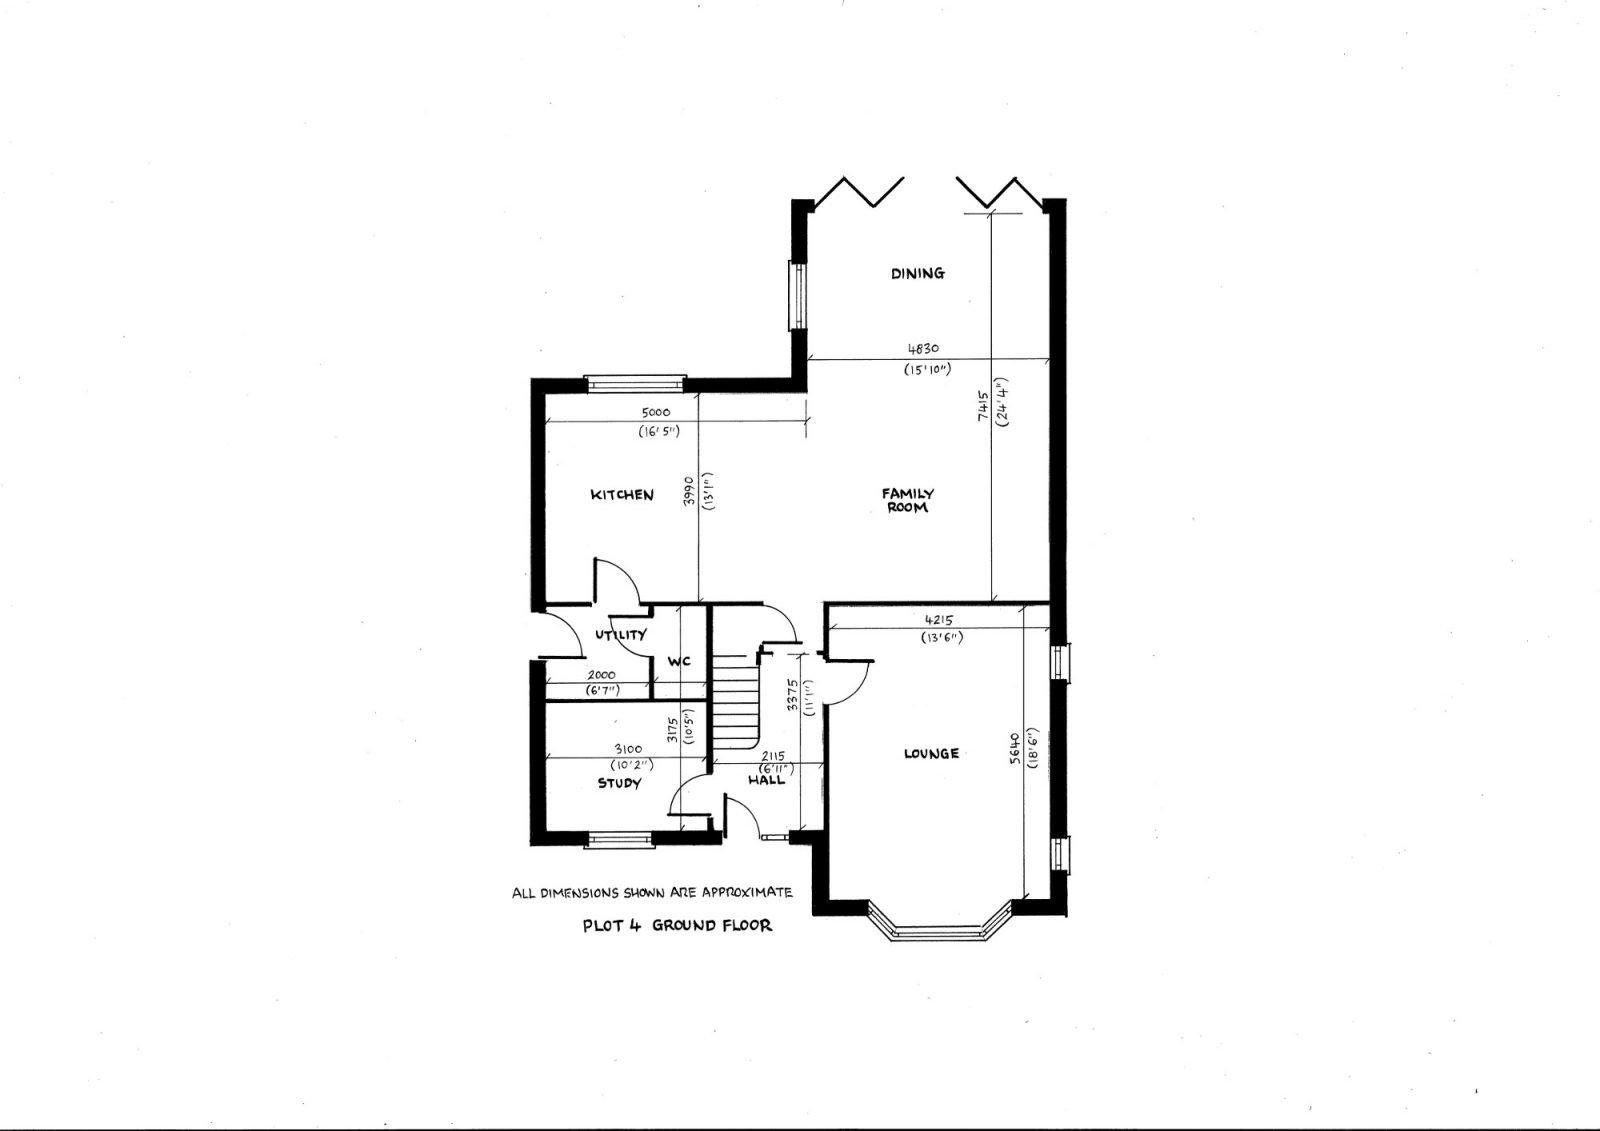 plot-4-ground-floor-plan